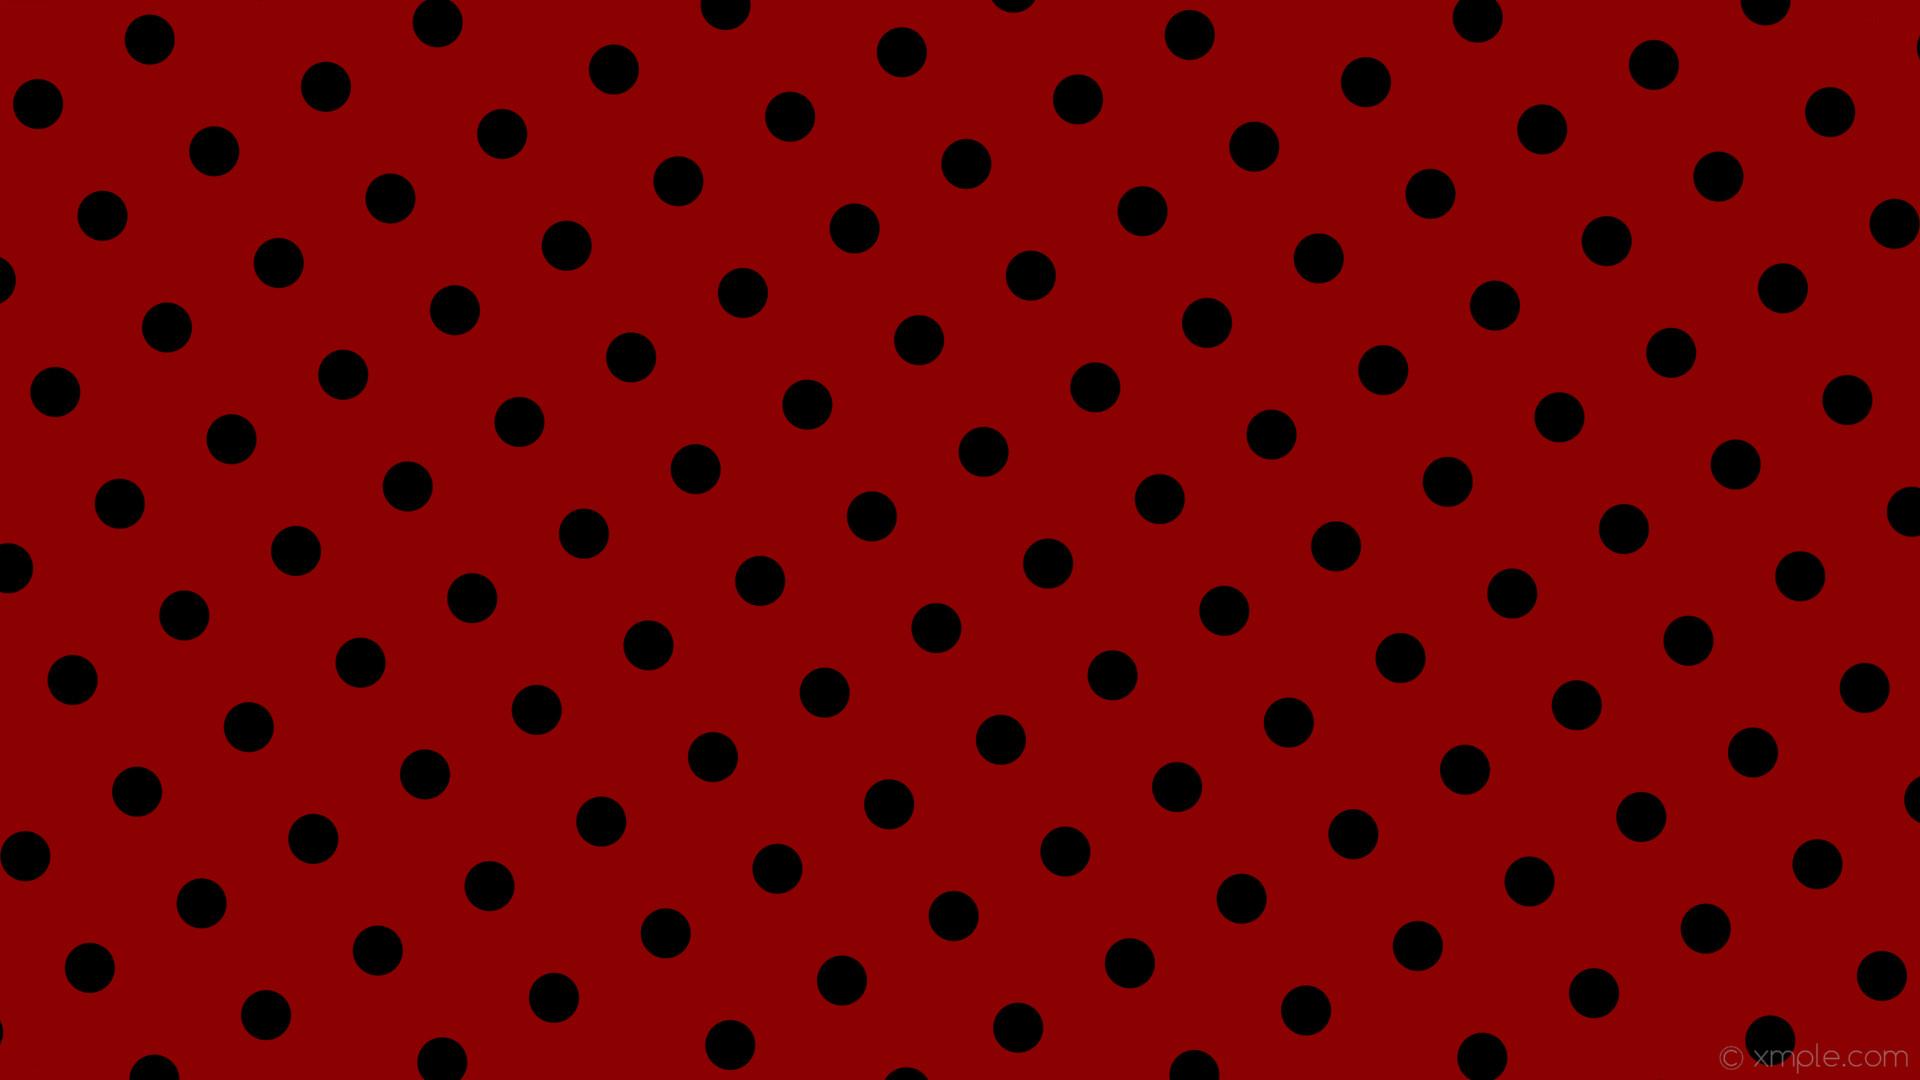 Best Wallpaper Halloween Polka Dot - 603137  Perfect Image Reference_608434.jpg